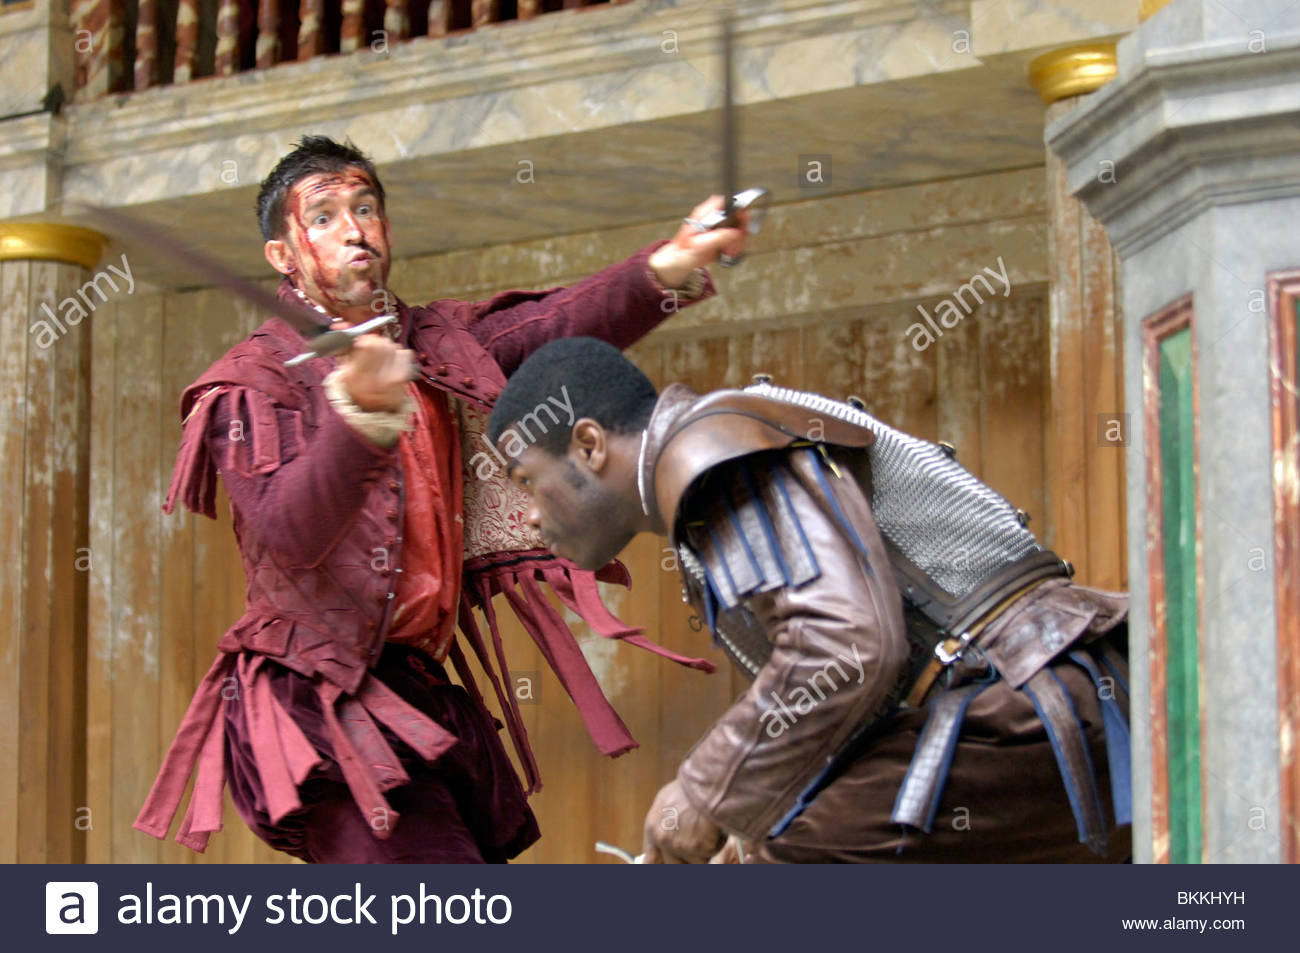 Coriolanus by William Shakespeare - Stock Image